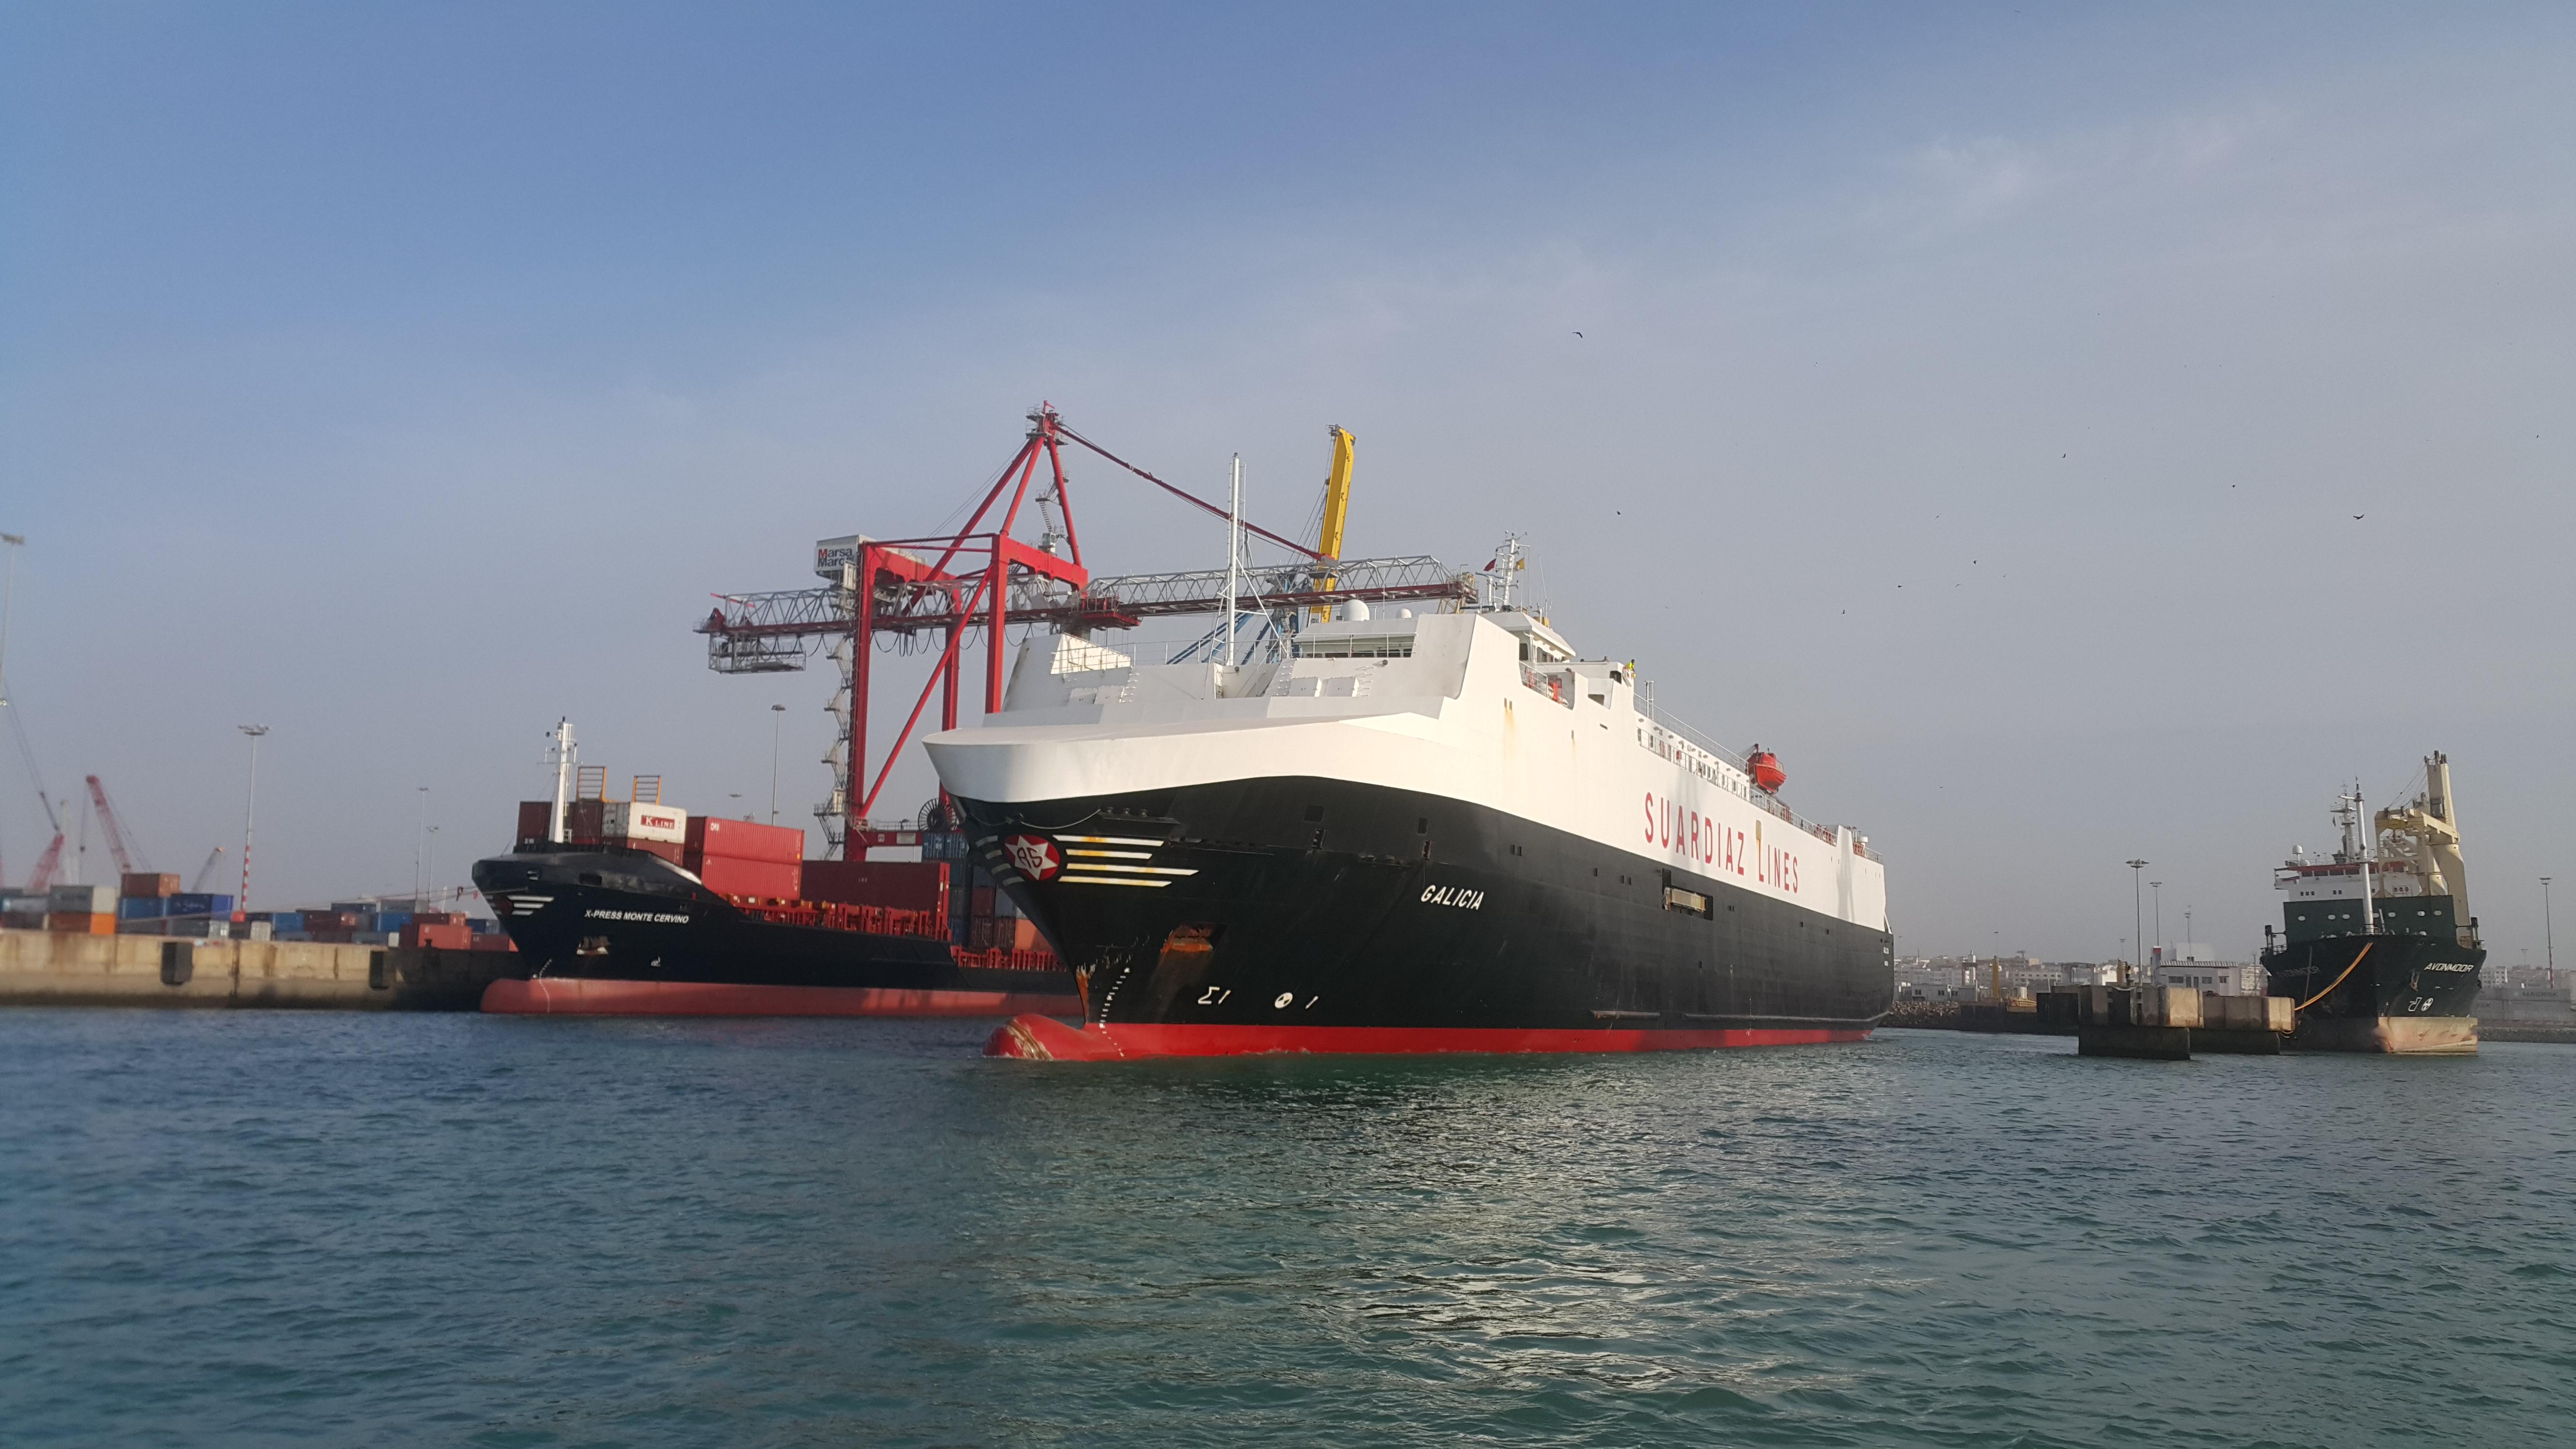 File:Car carrier (roro) GALICIA au port jpg - Wikimedia Commons